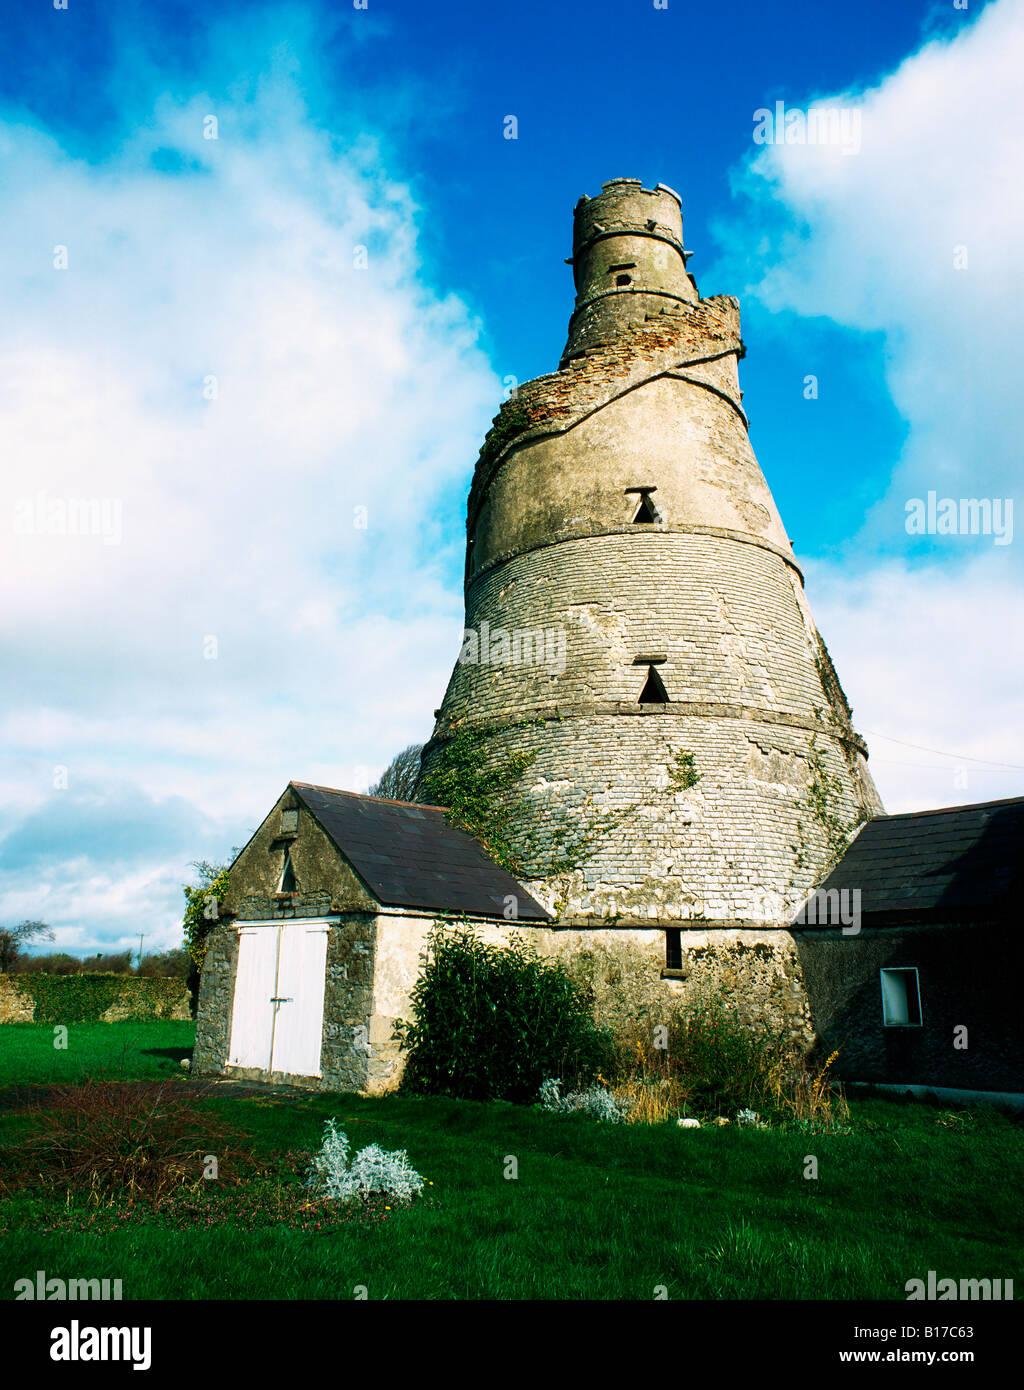 The Wonderful Barn, Leixlip, County Kildare, Ireland Stock ...